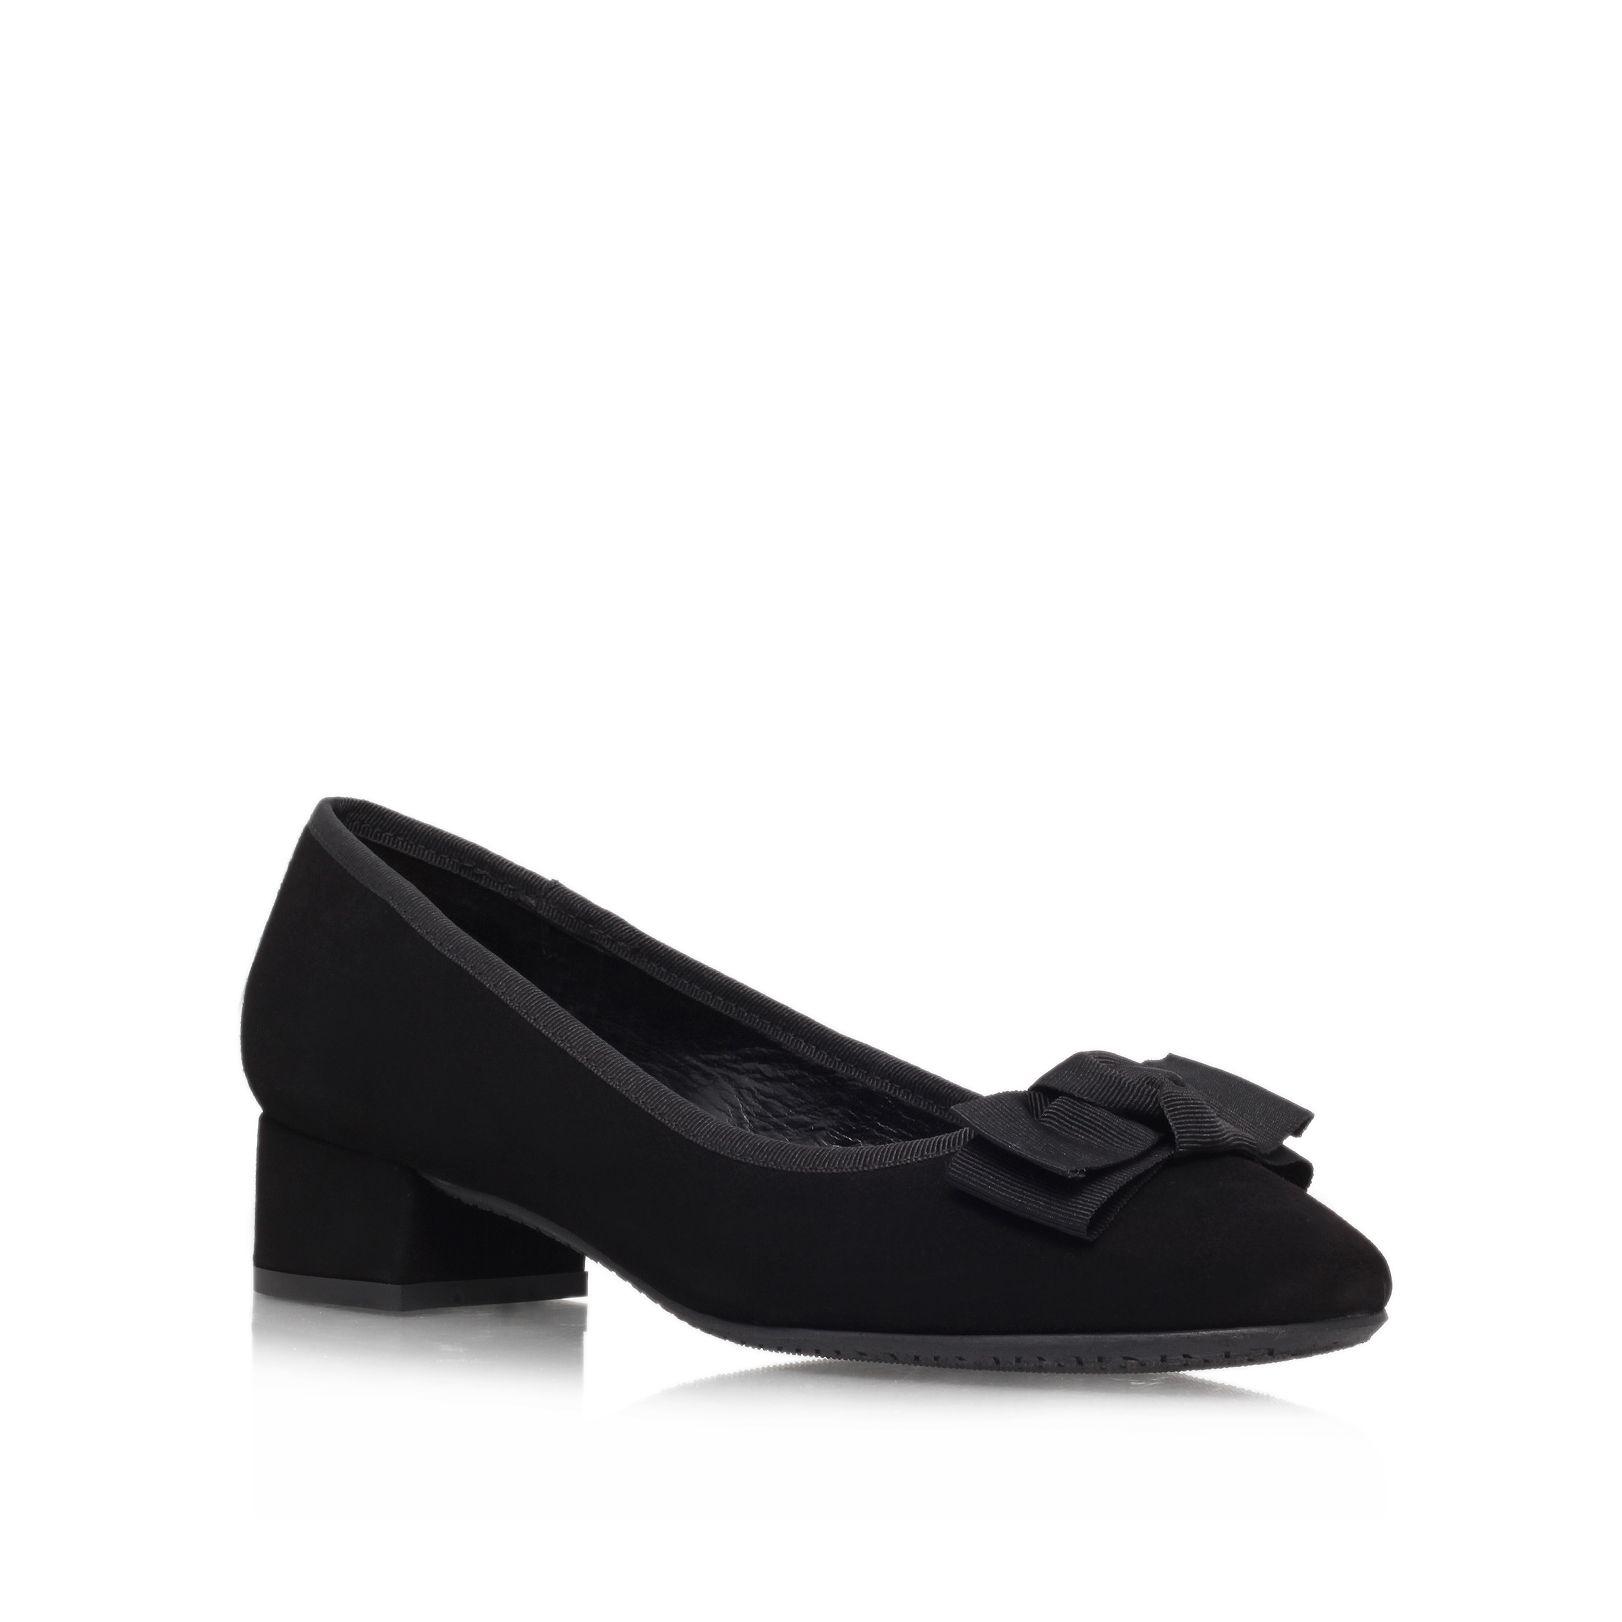 carvela kurt geiger aggie court shoes in black lyst